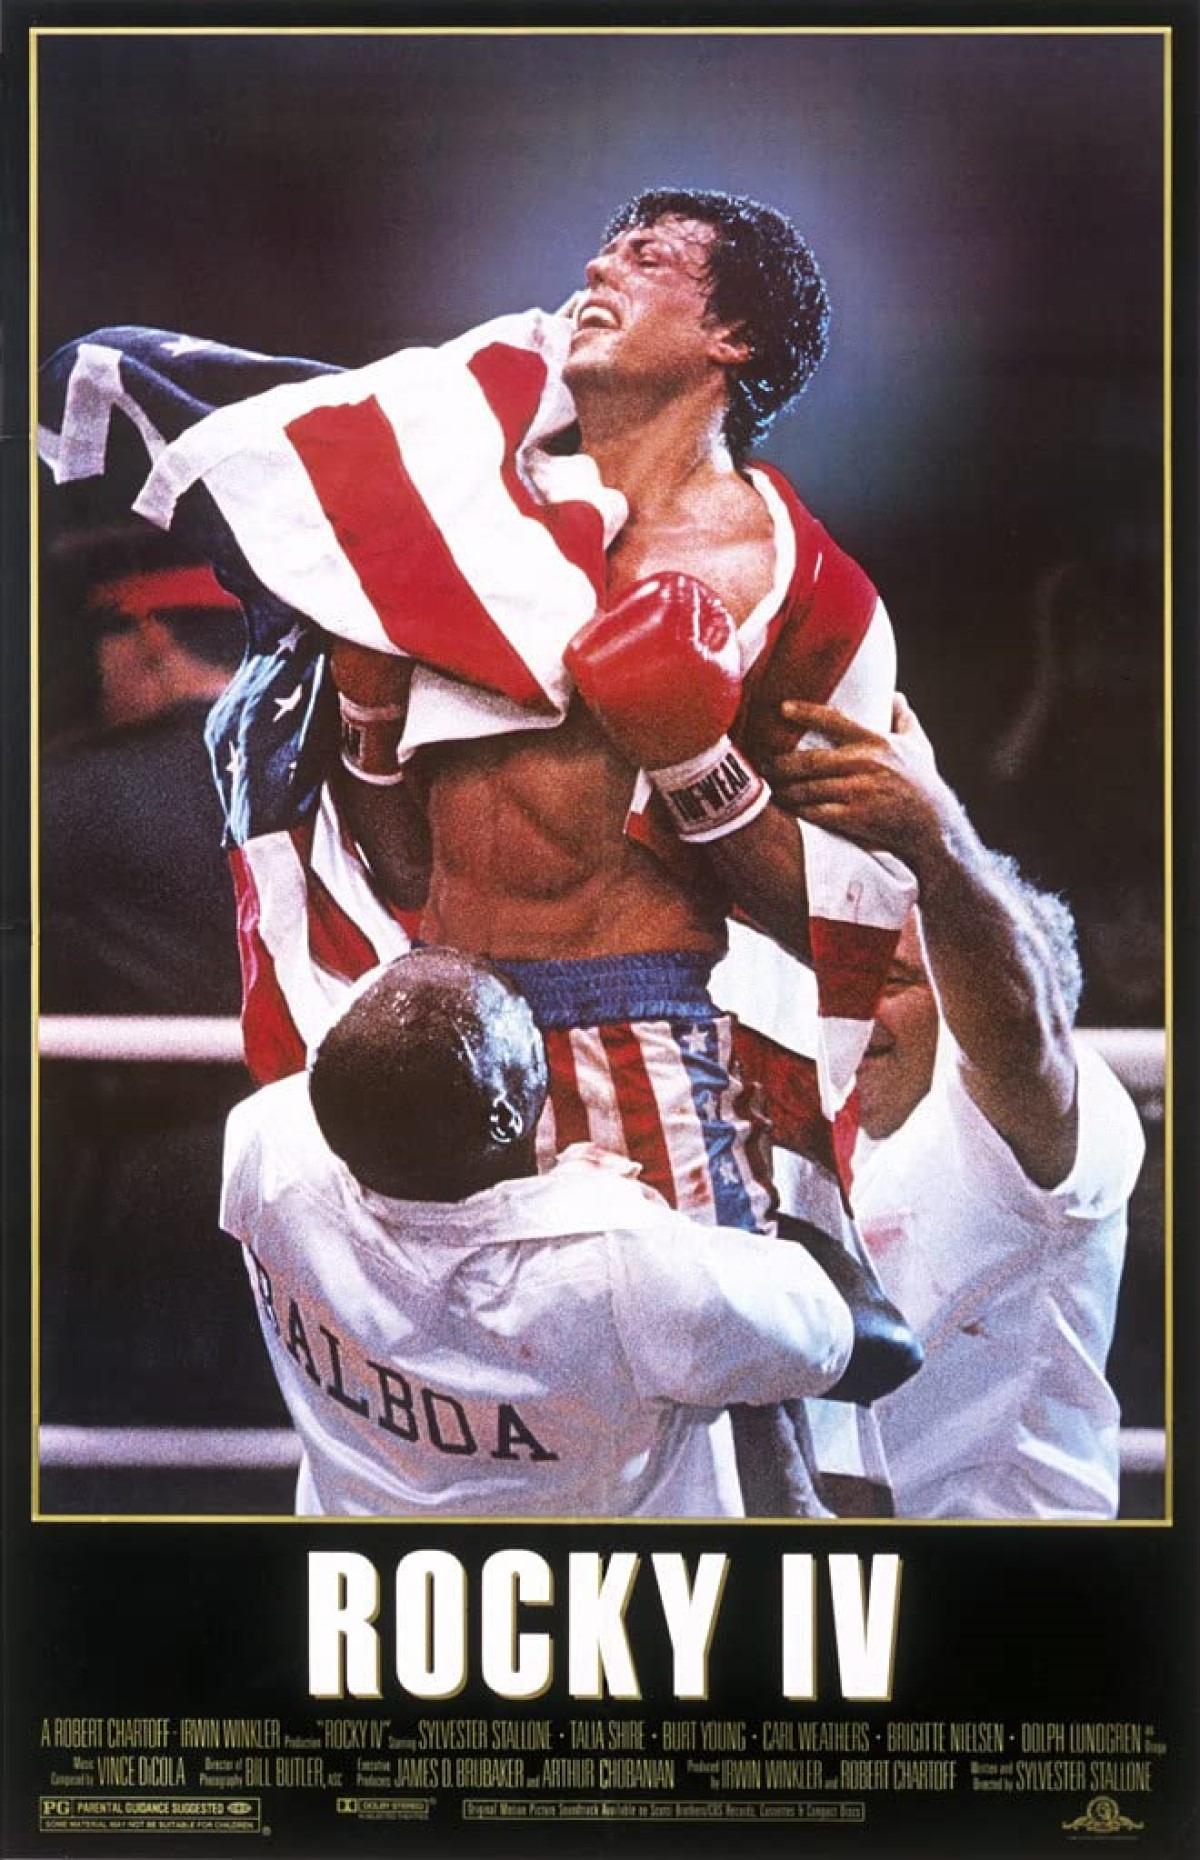 Rocky IV - Der Kampf des Jahrhunderts